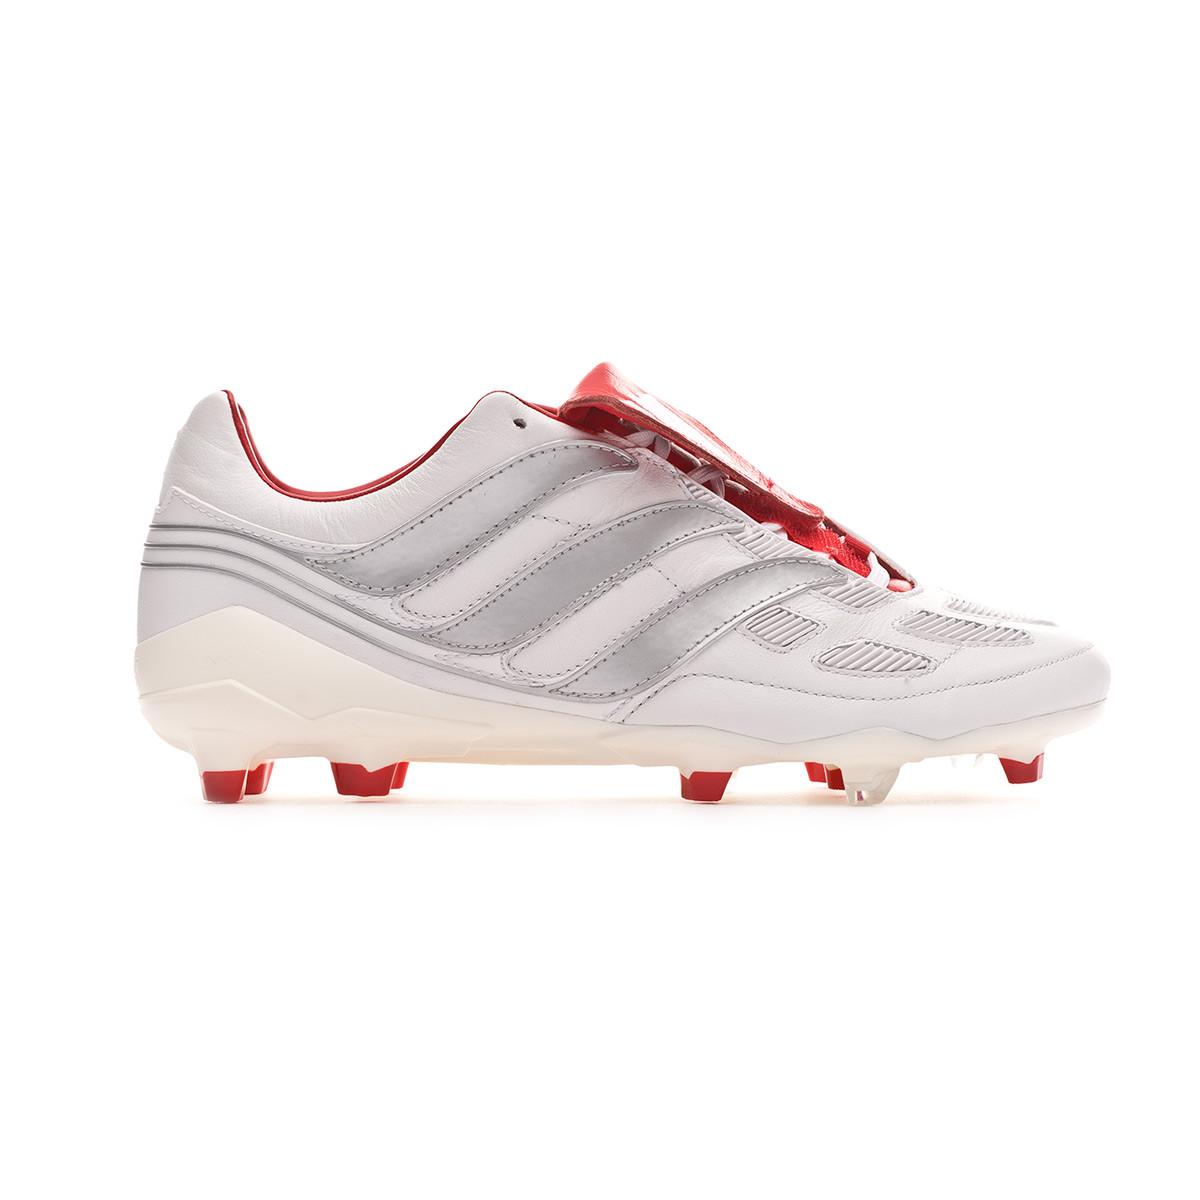 78ac7a7fb7a Football Boots adidas Predator Precision FG DB White-Silver metallic- Predator Red - Tienda de fútbol Fútbol Emotion